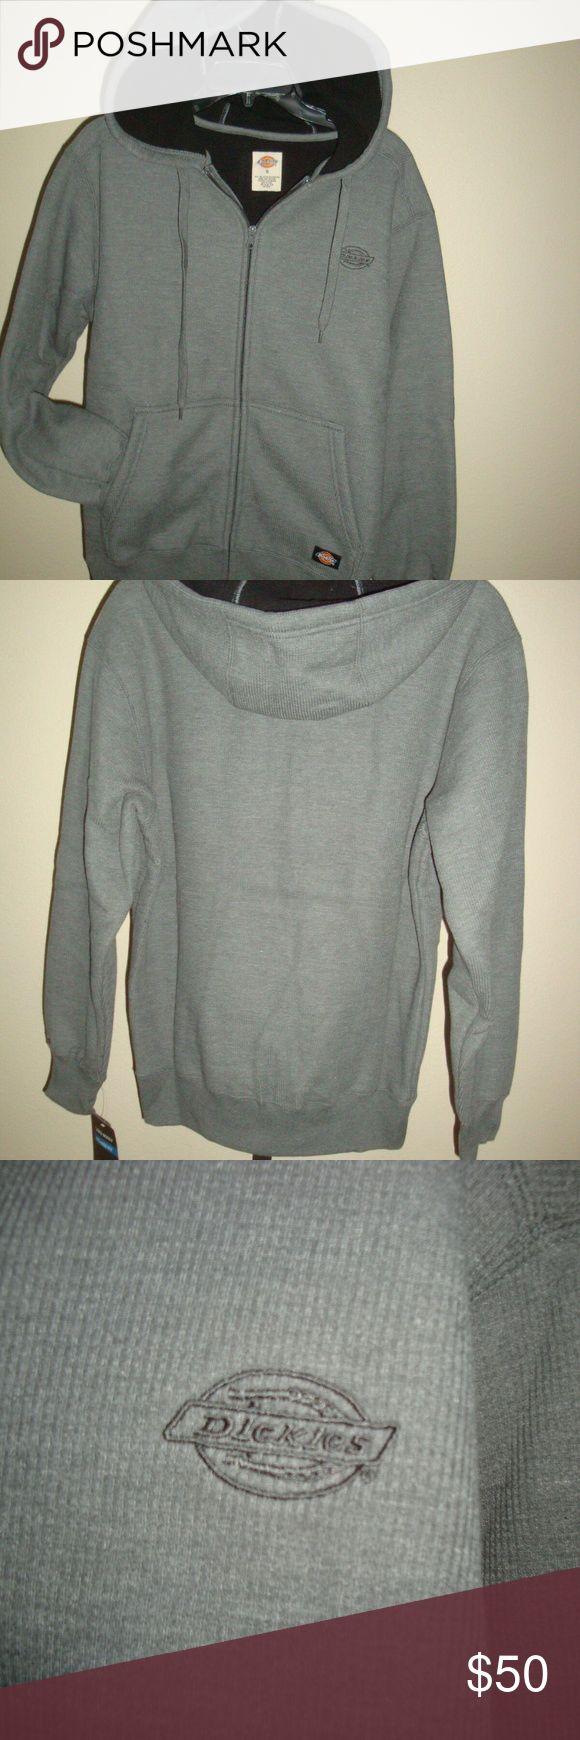 Dickies Full Zip Thermal Sweatshirt Sherpa Gray S Sweatshirts Thermal Hoodie Sweatshirt Shirt [ 1740 x 580 Pixel ]